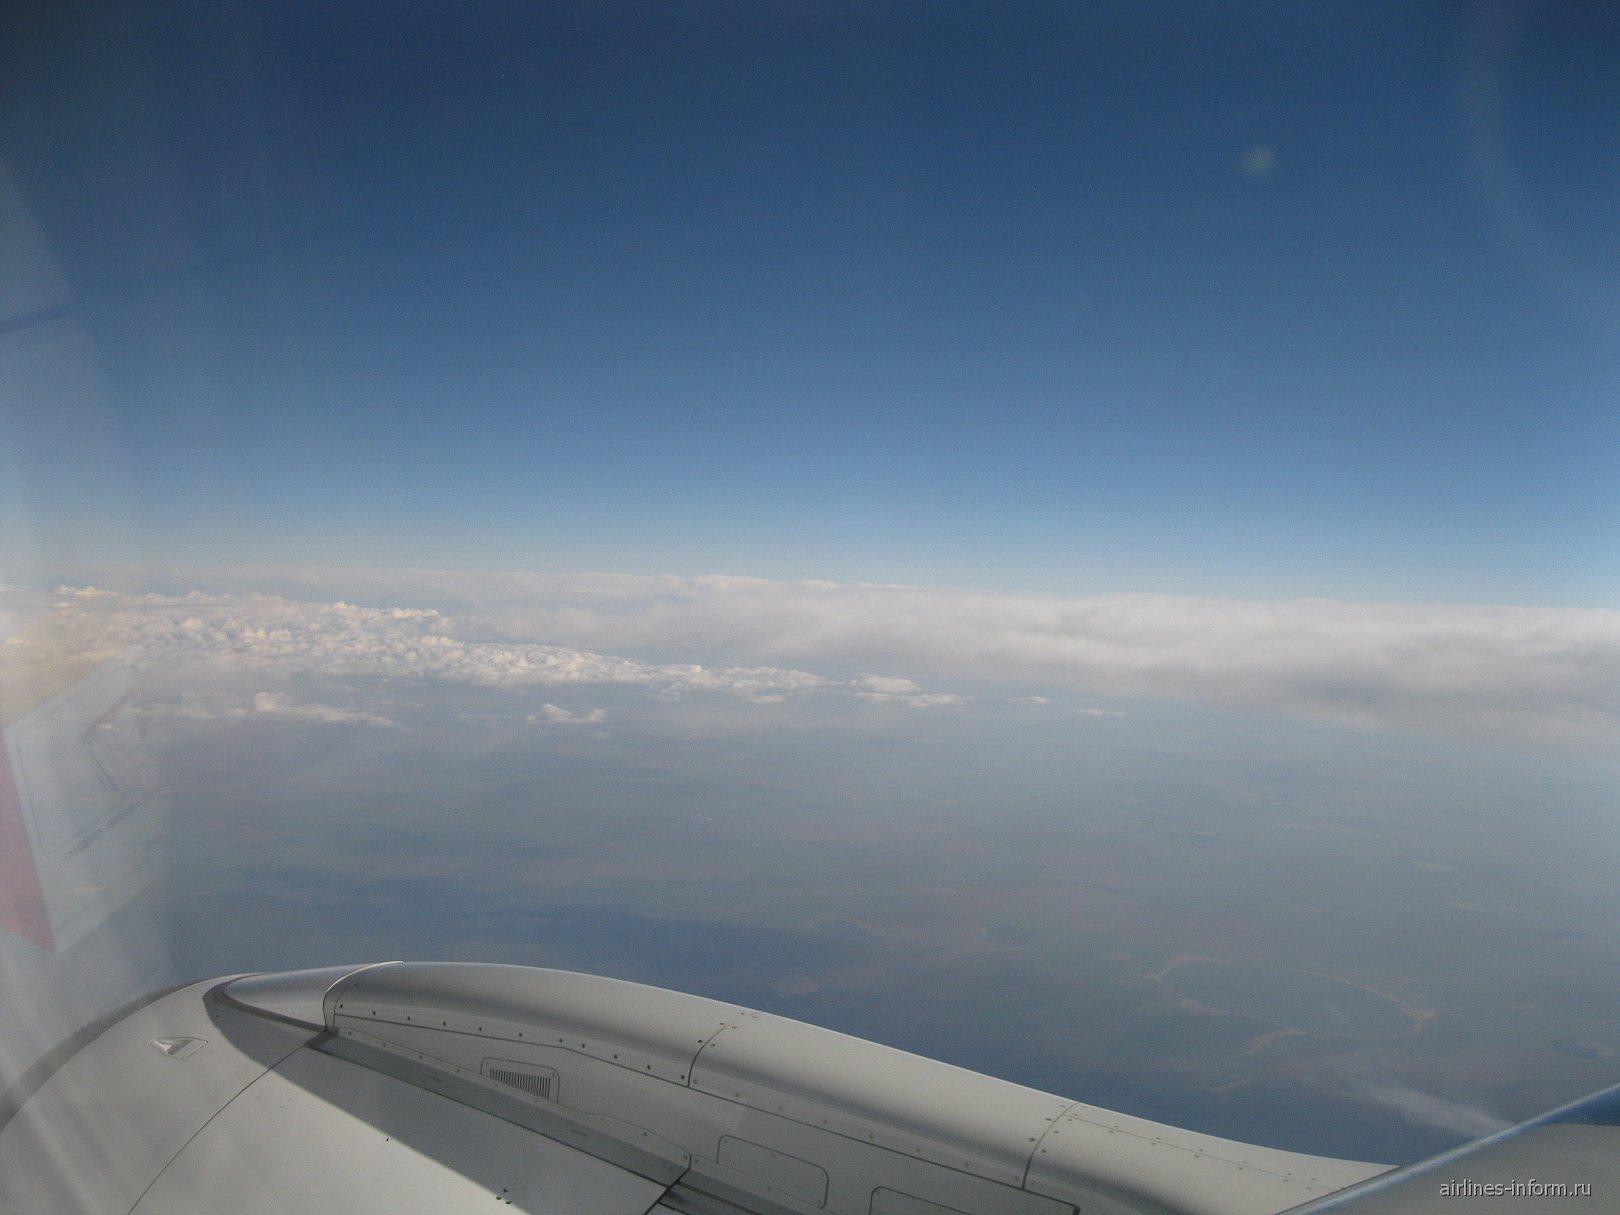 Рейс Астана-Санкт-Петербург авиакомпании Air Astana